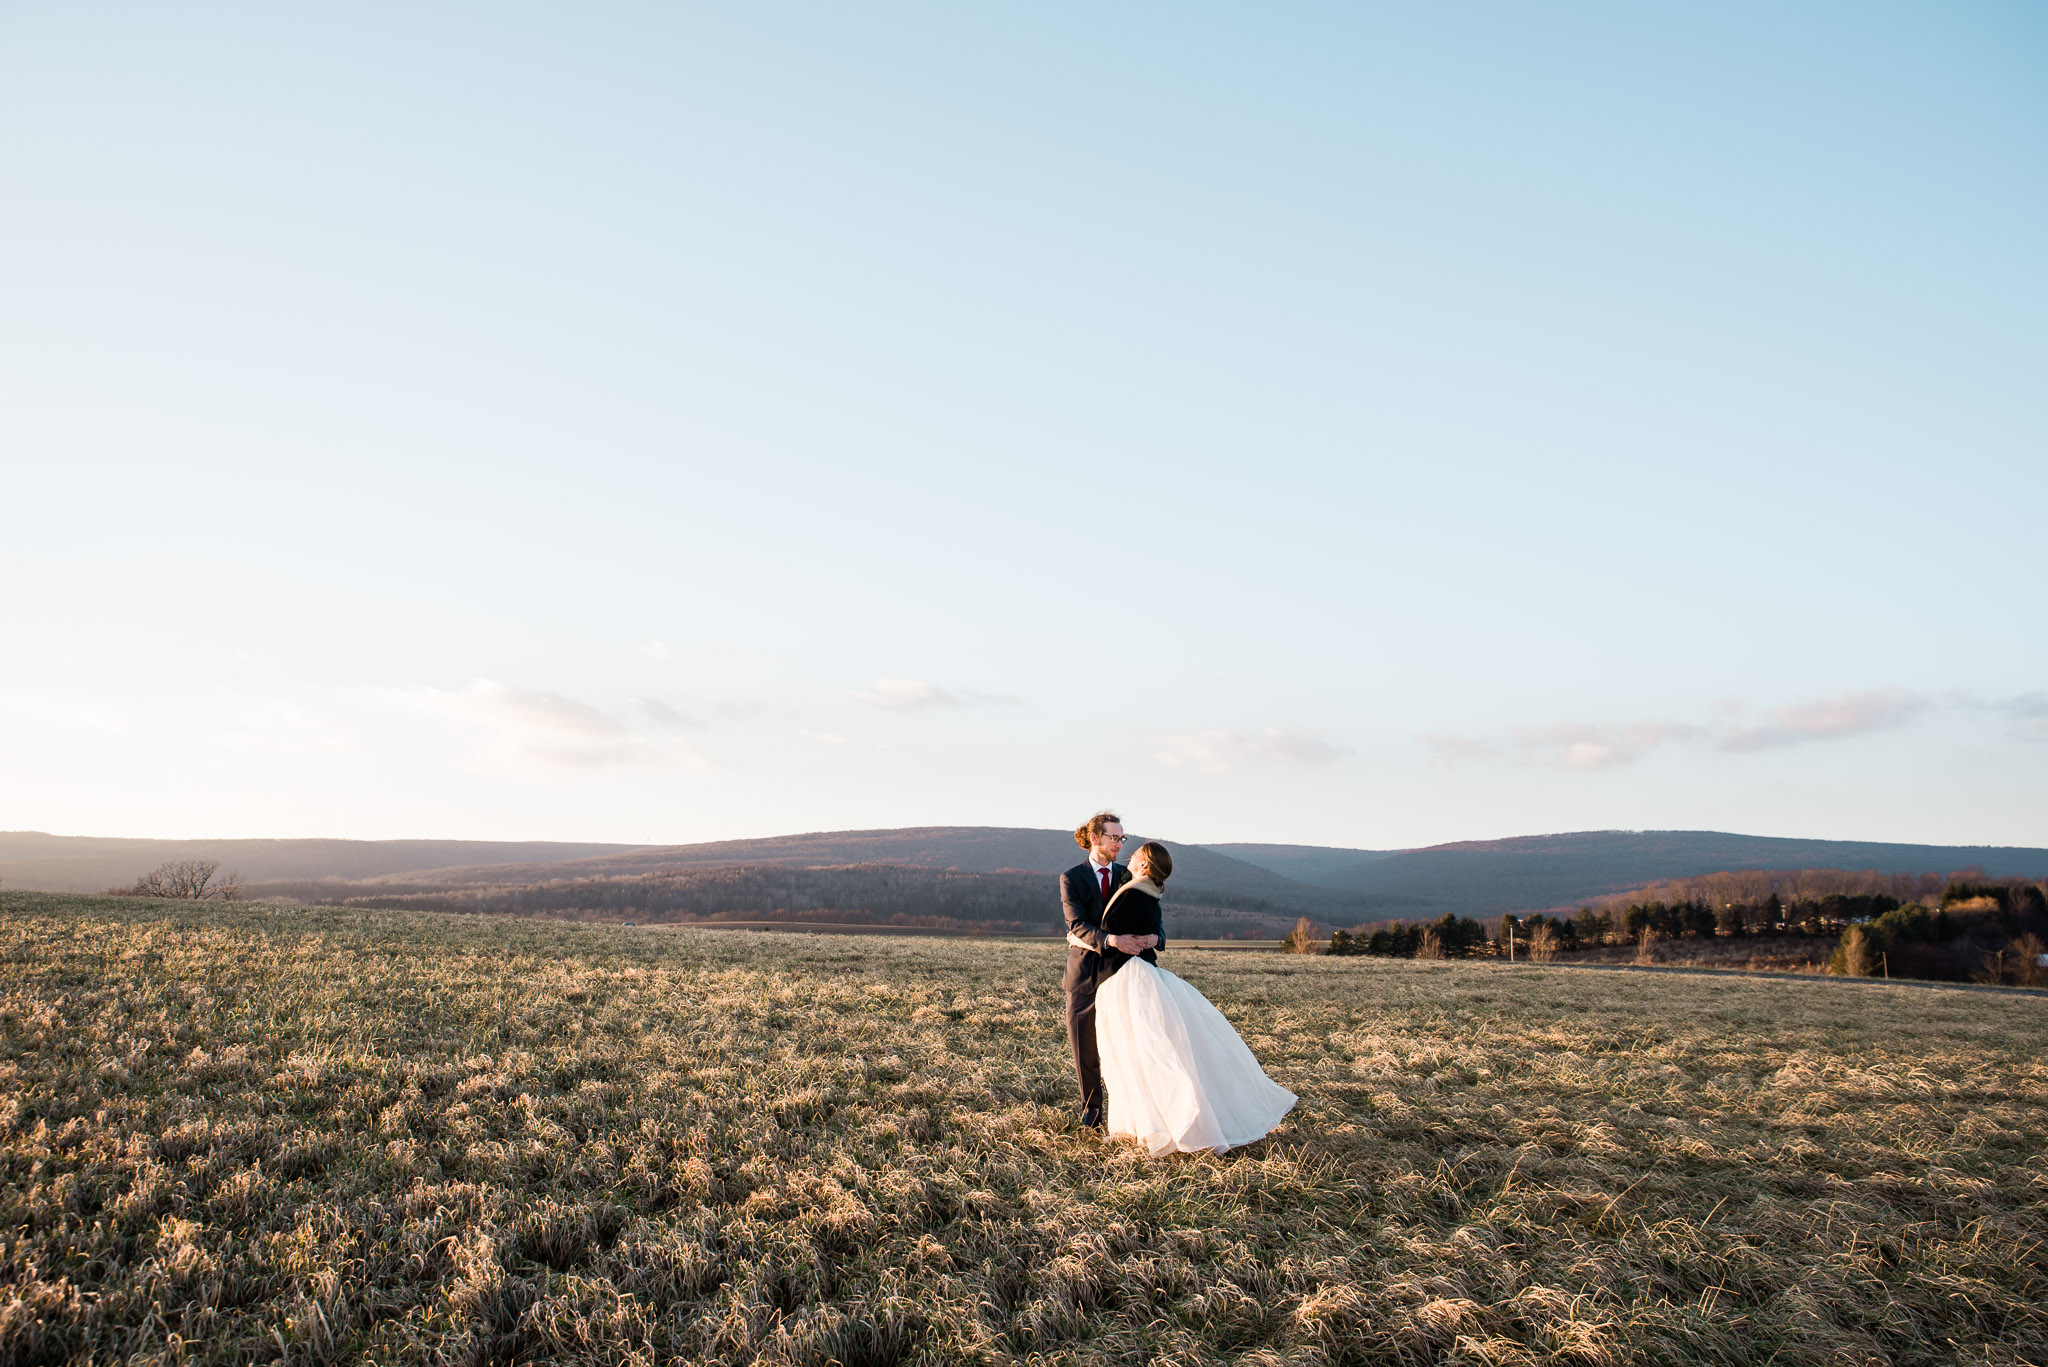 Western PA wedding photographer, wedding couple portraits, mariah fisher photography-5250.jpg